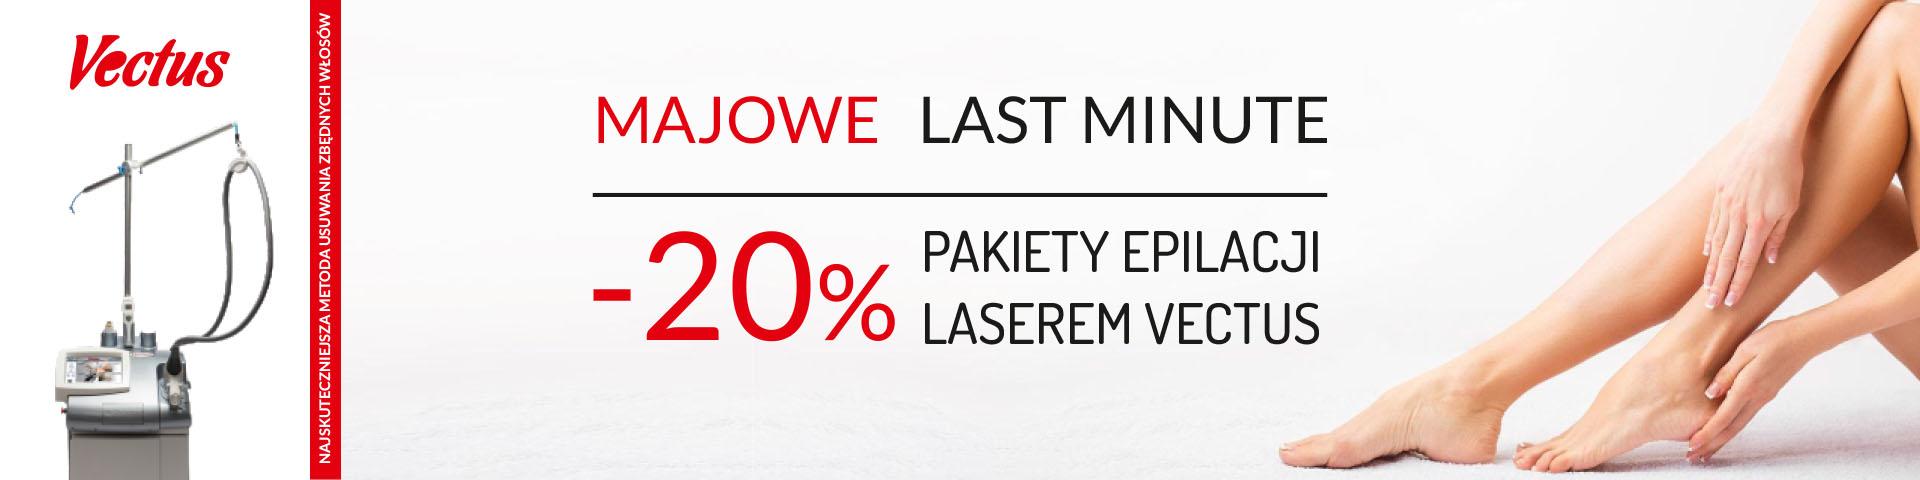 Majowe Last Minute - promocja na pakiety depilacji laserowej Vectus